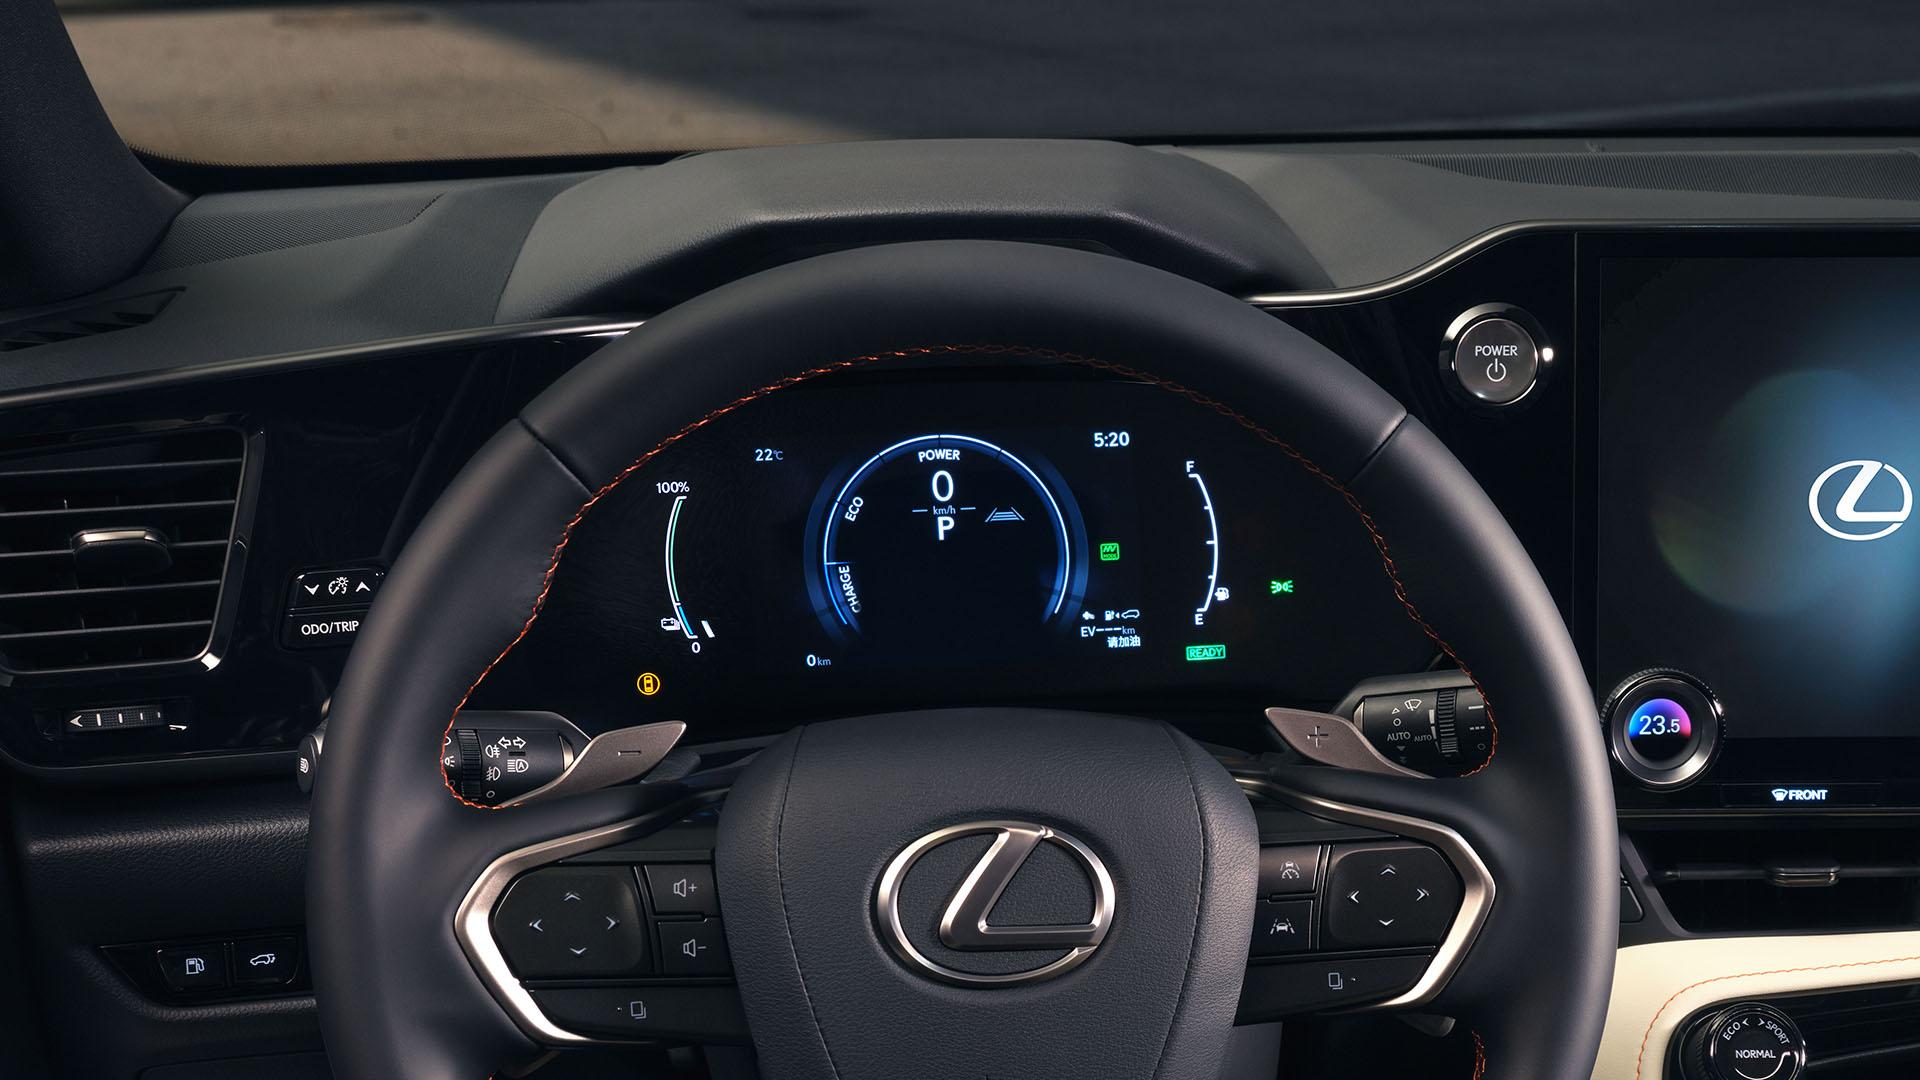 2021 lexus nx experience interior front multi information display